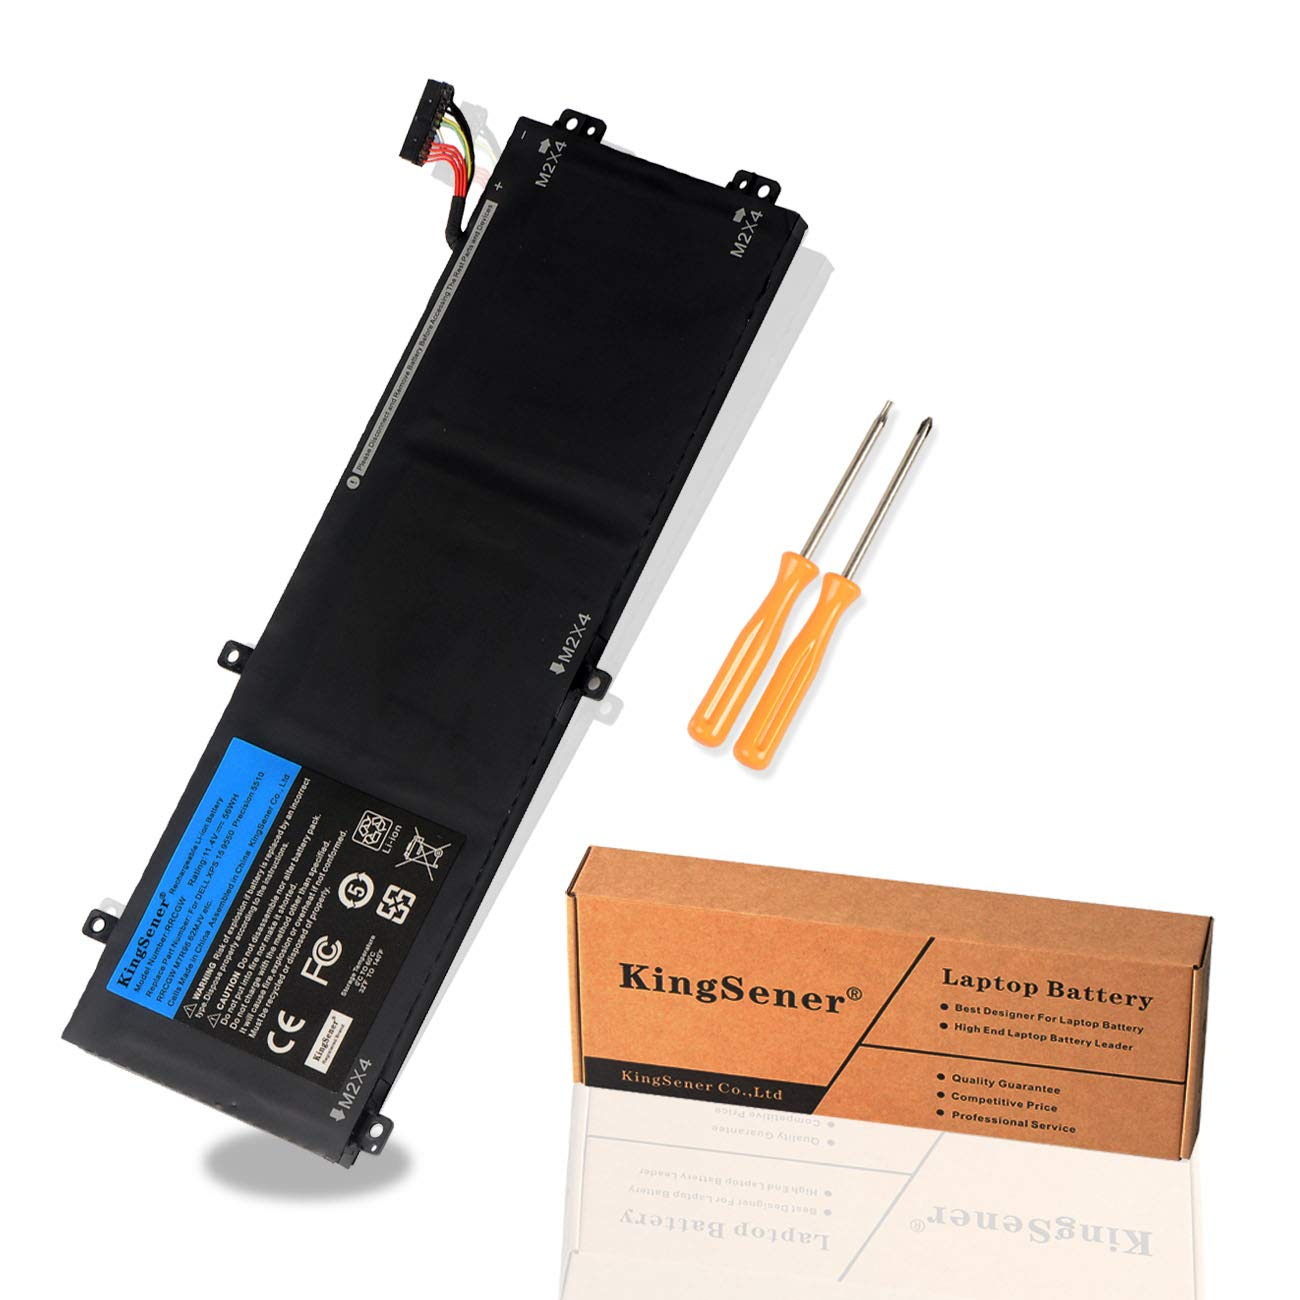 Bateria RRCGW M7R96 62MJV para Dell XPS 15 9550 Precision 55